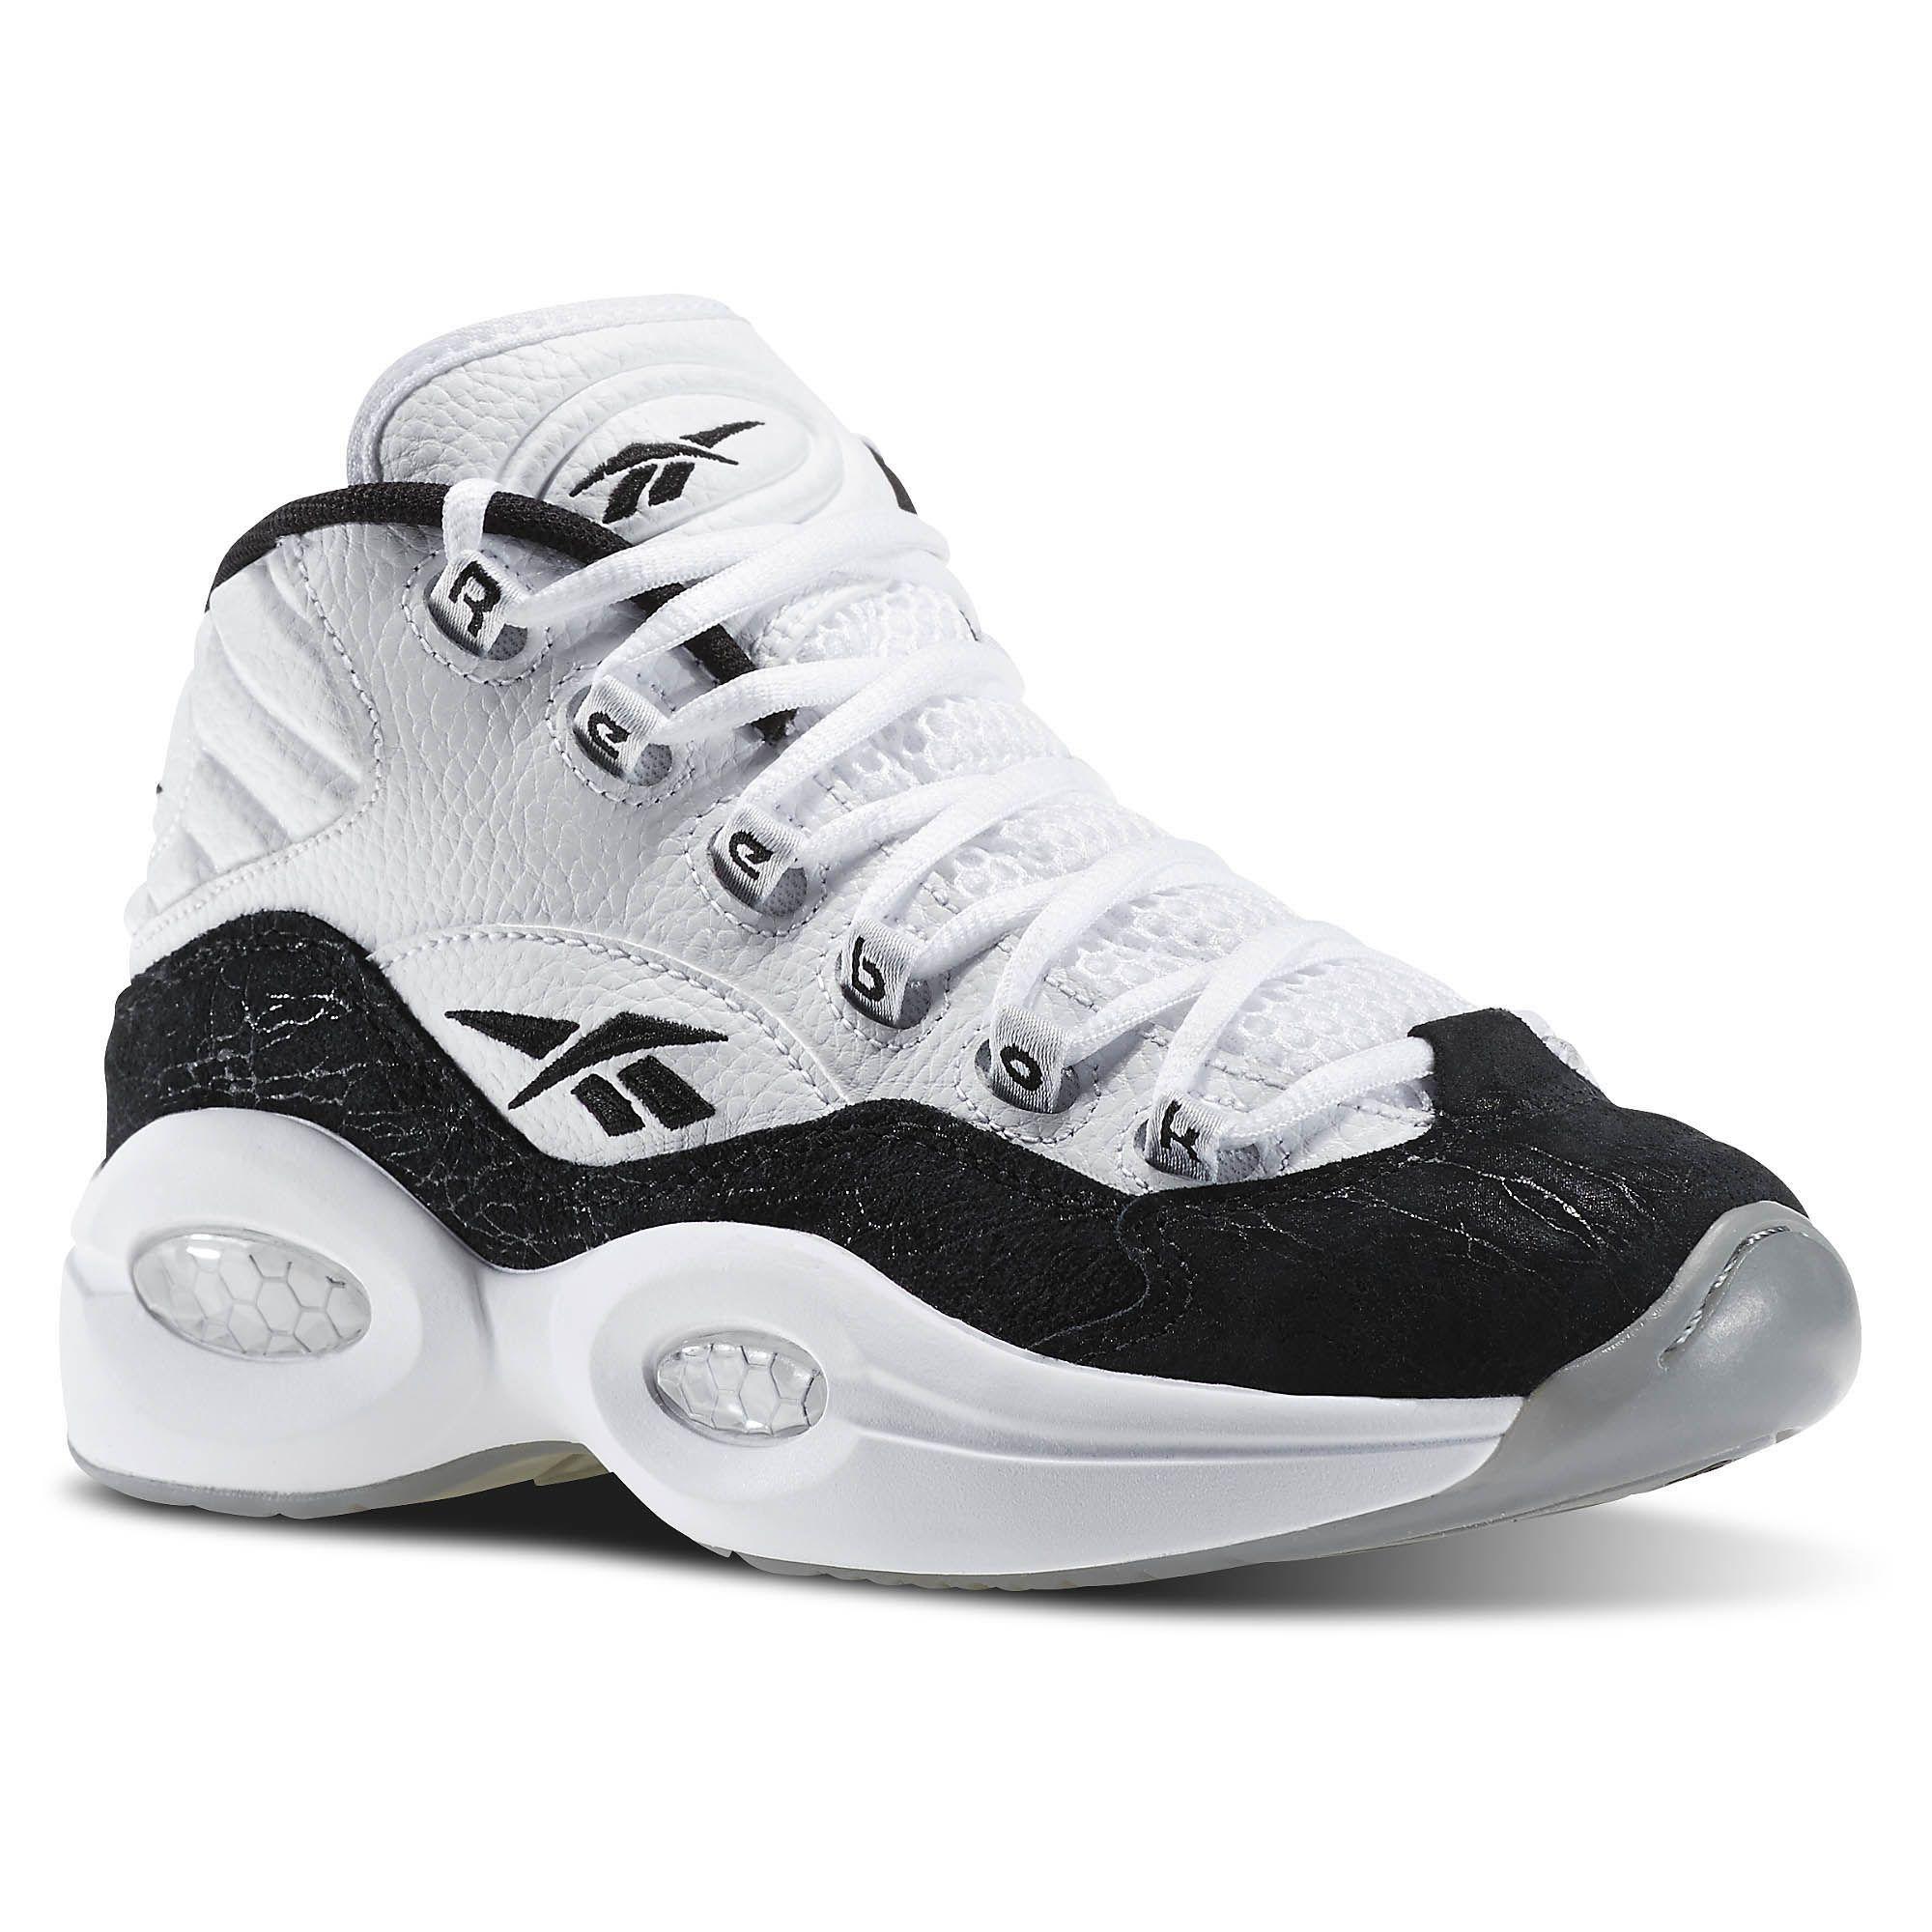 c7cdaea4e306af Reebok - Question Mid Fila Basketball Shoes